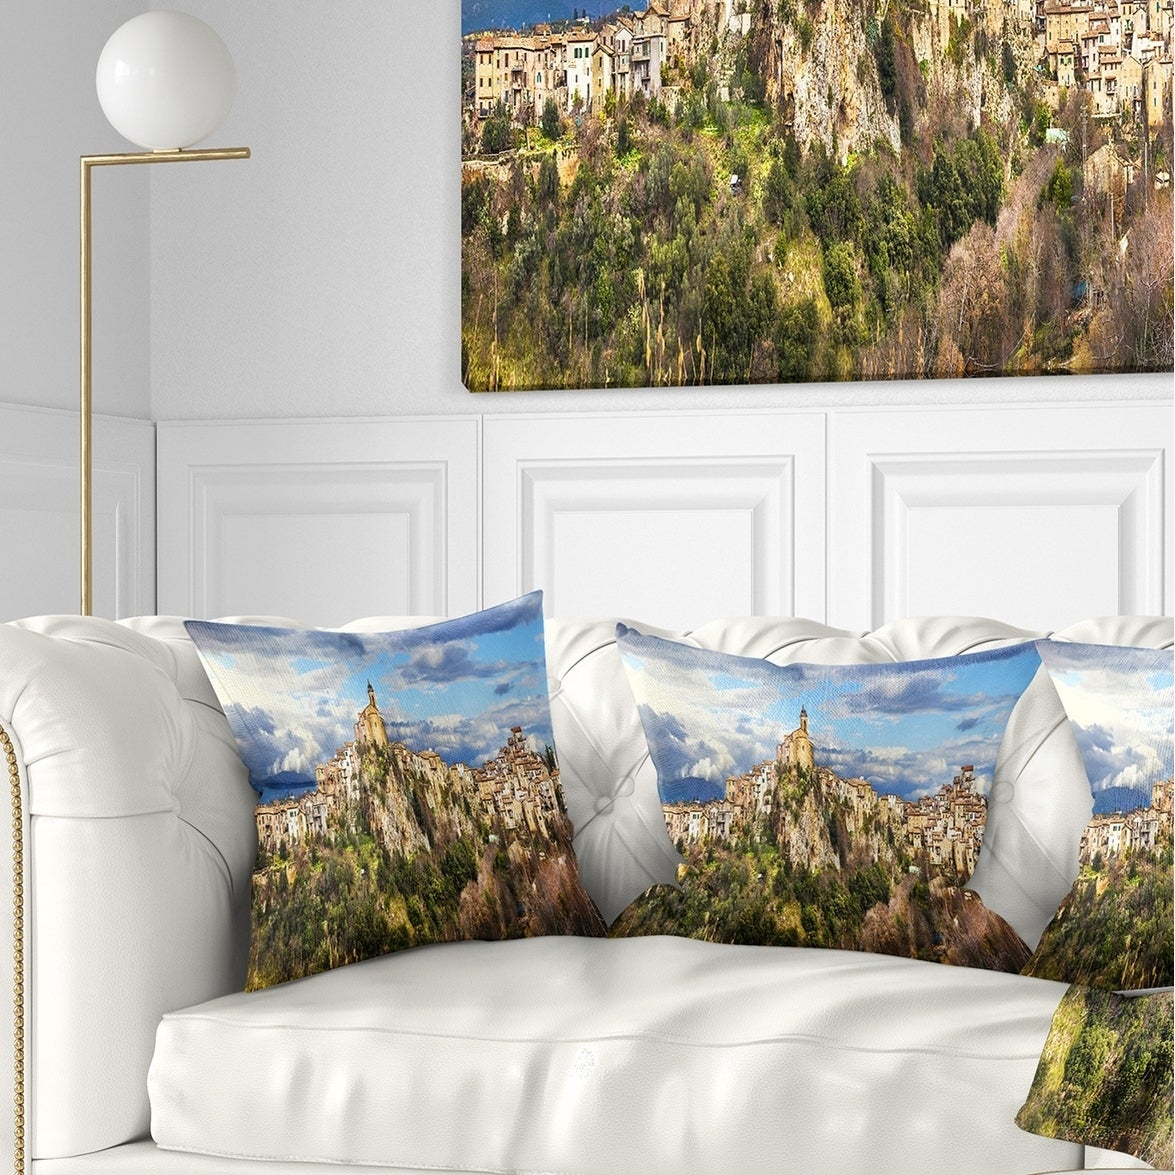 Designart CU7454-18-18 Toffia Hilltop Village Italy Landscape Printed Throw Pillow 18 x 18